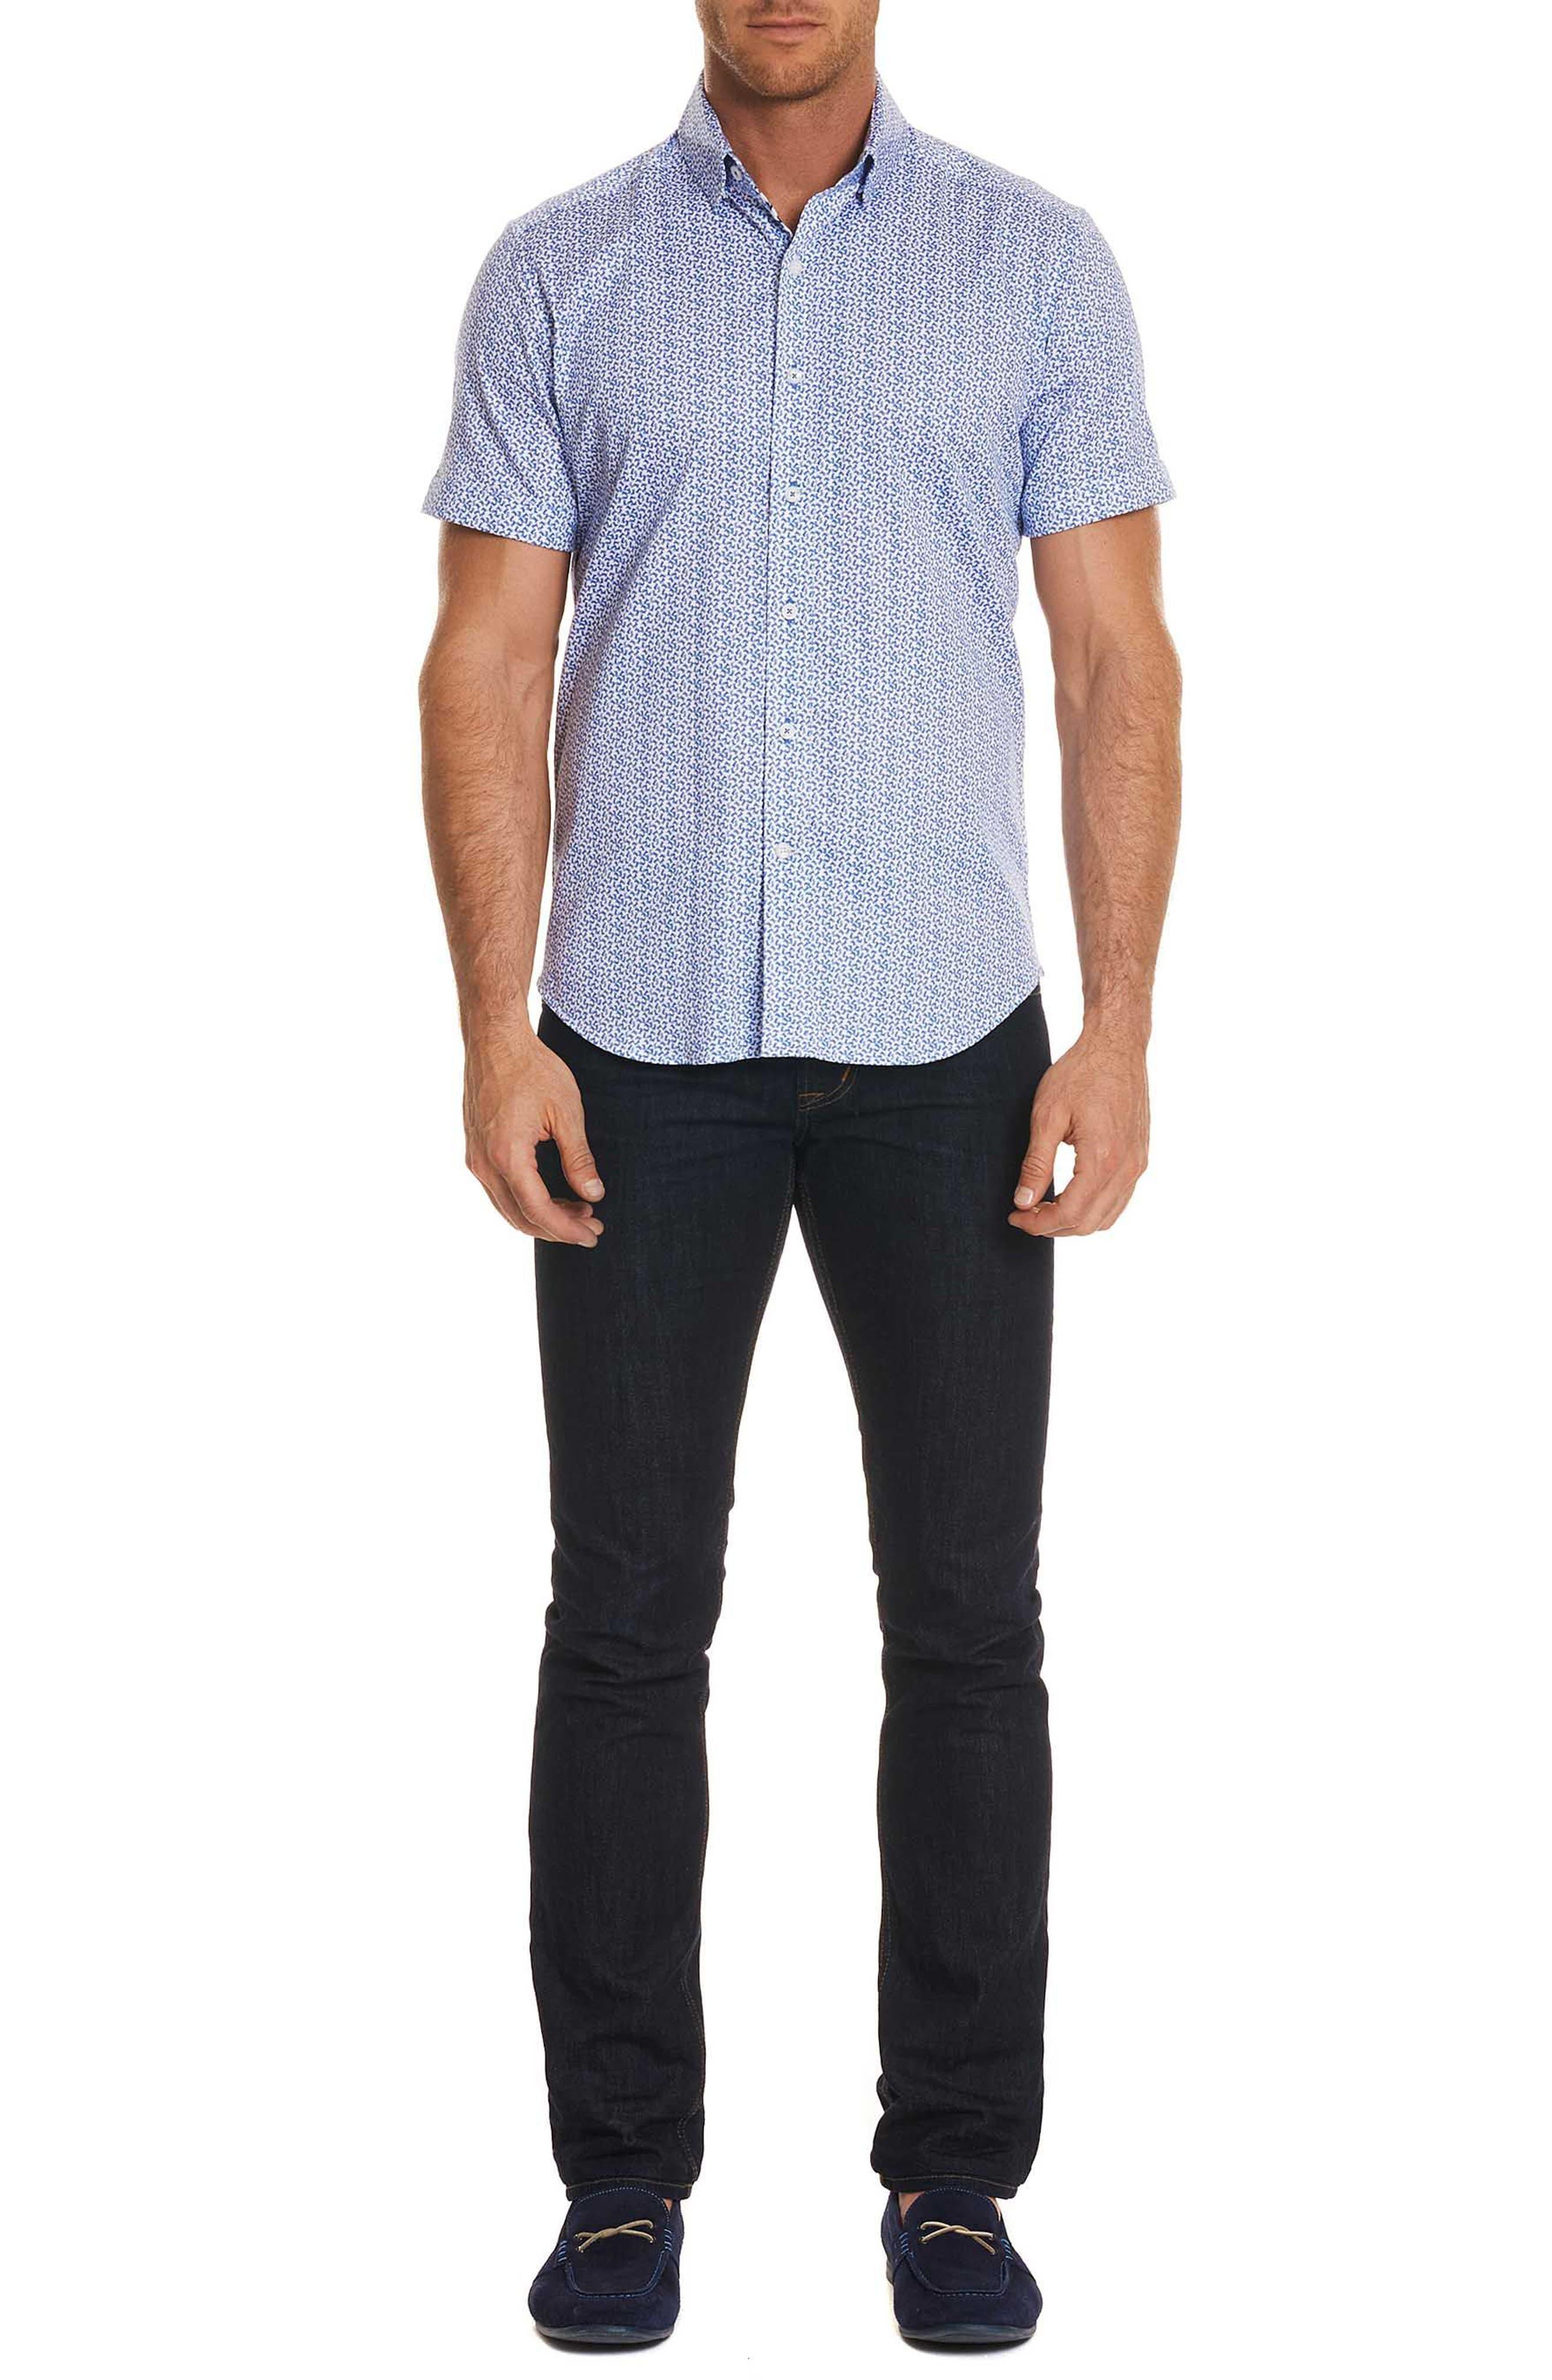 Hartman Tailored Fit Sport Shirt,                             Alternate thumbnail 6, color,                             400